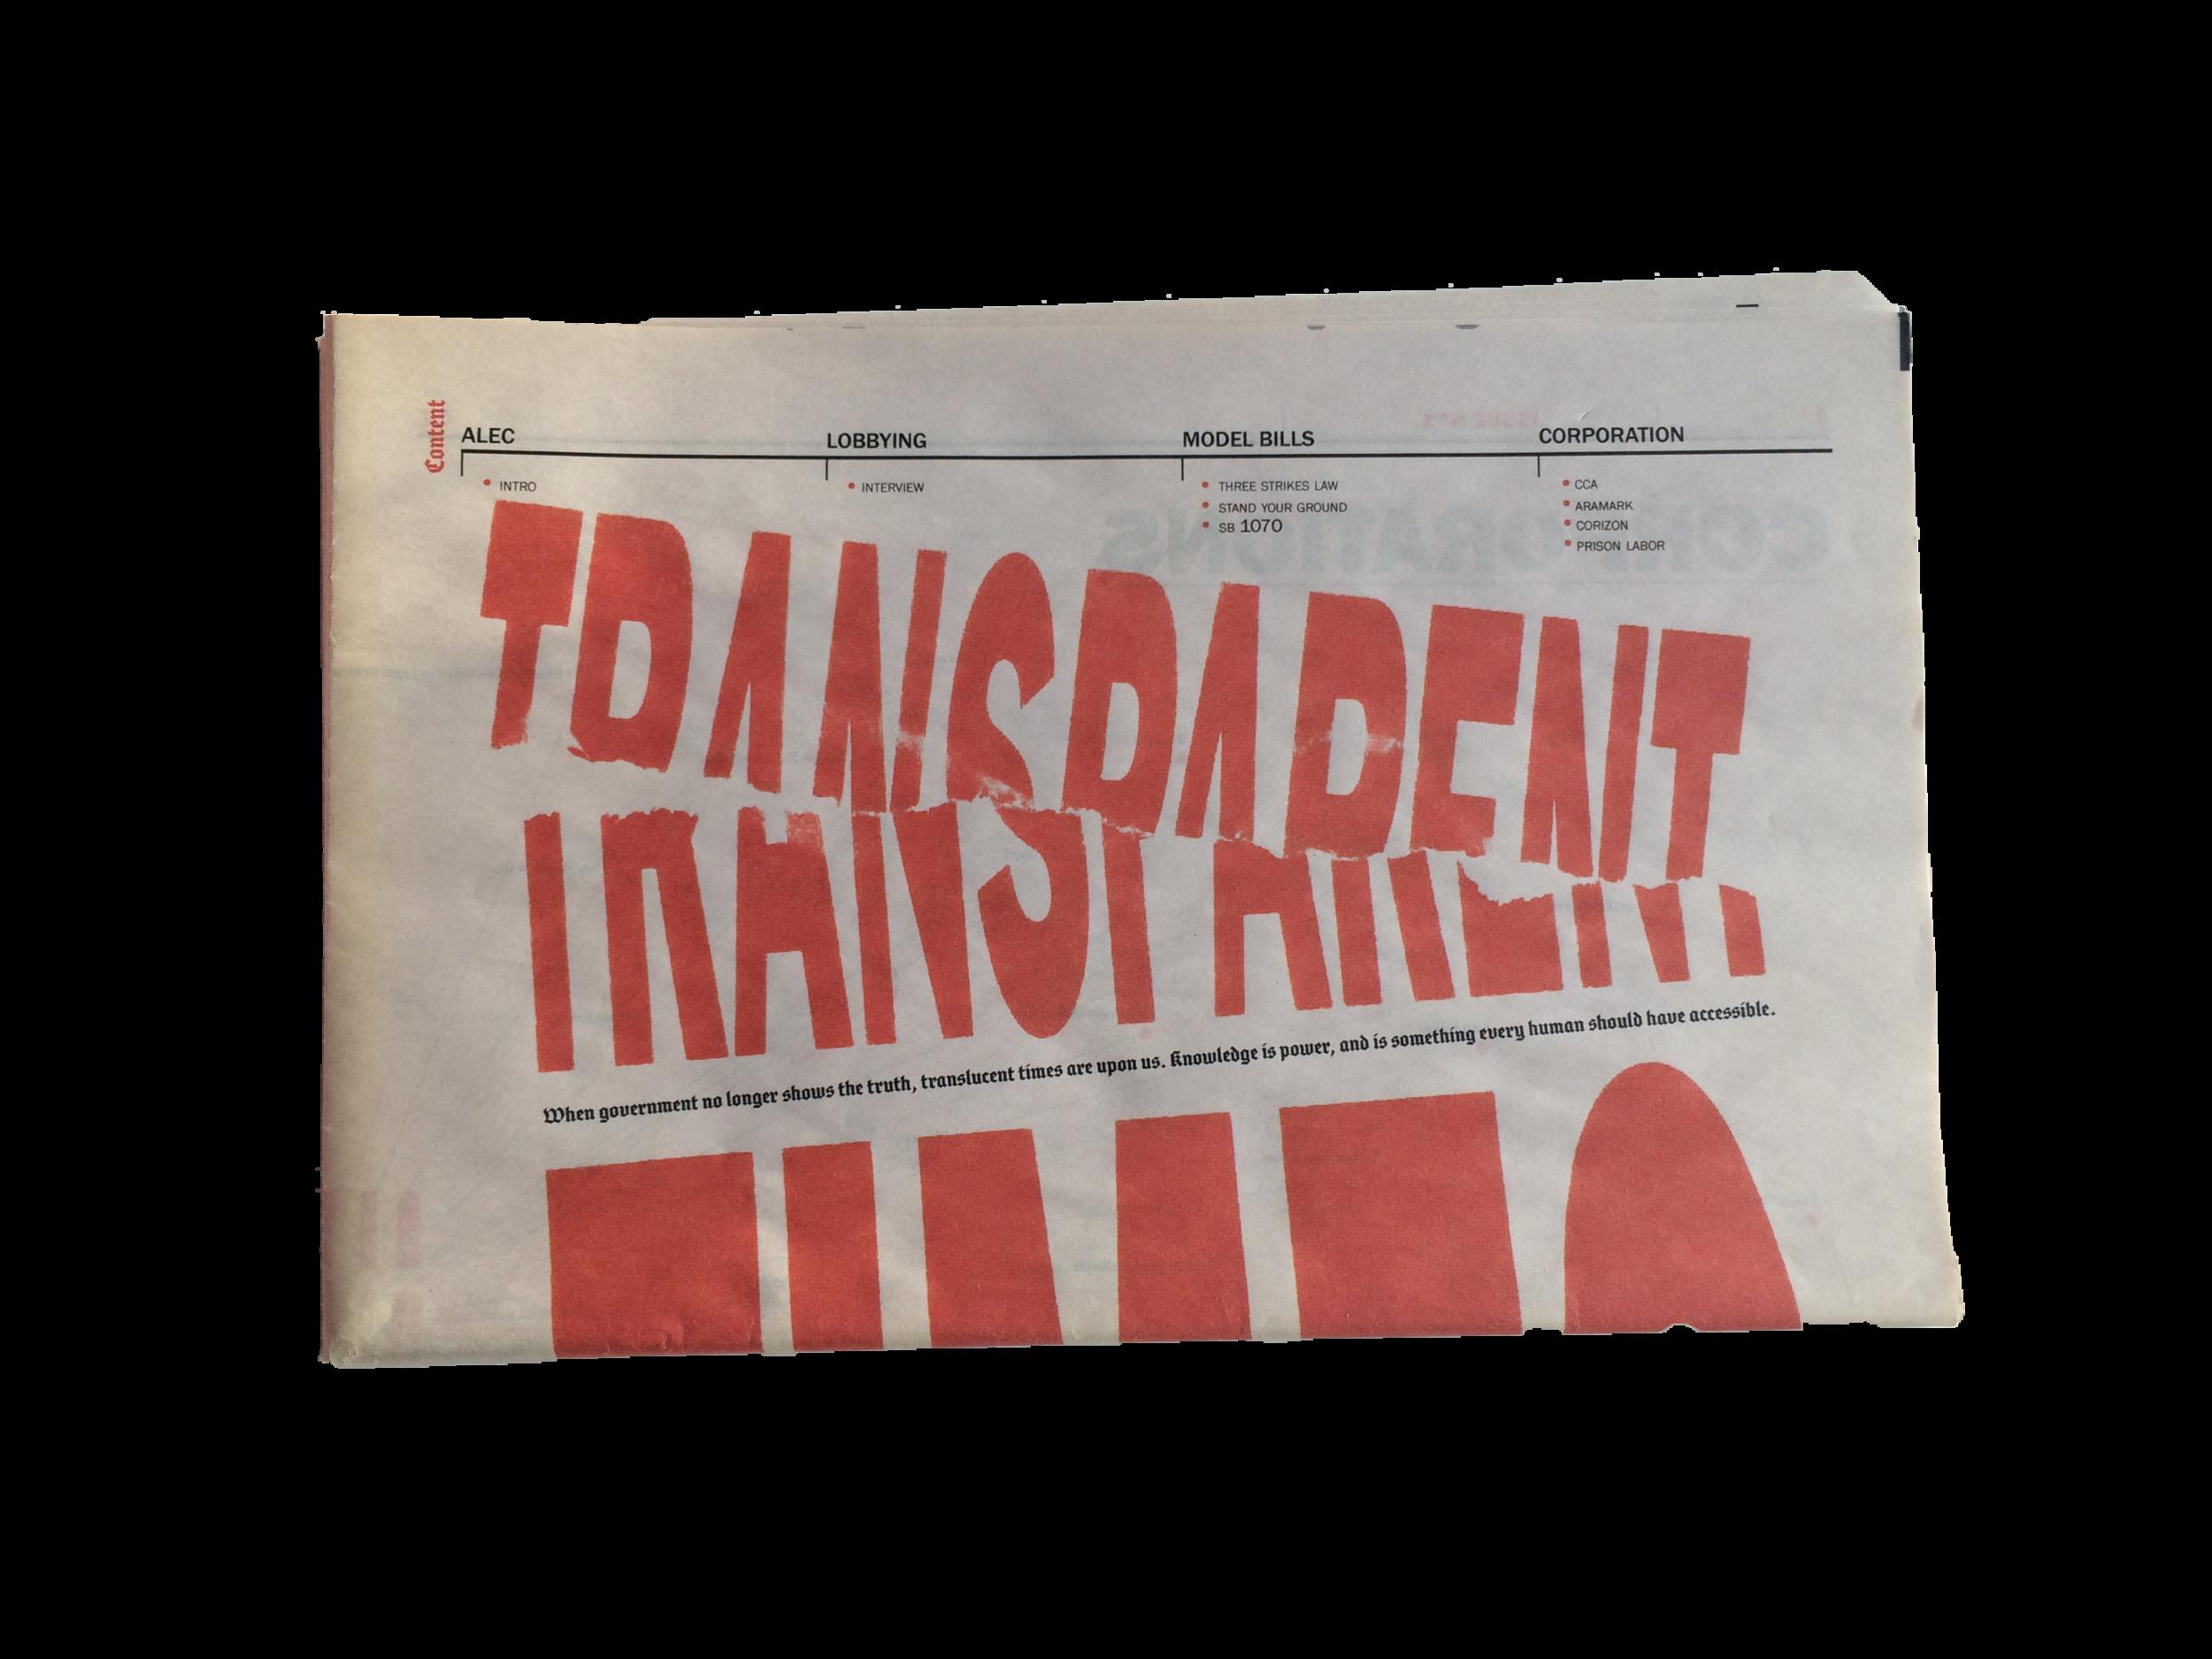 transparentcover.png